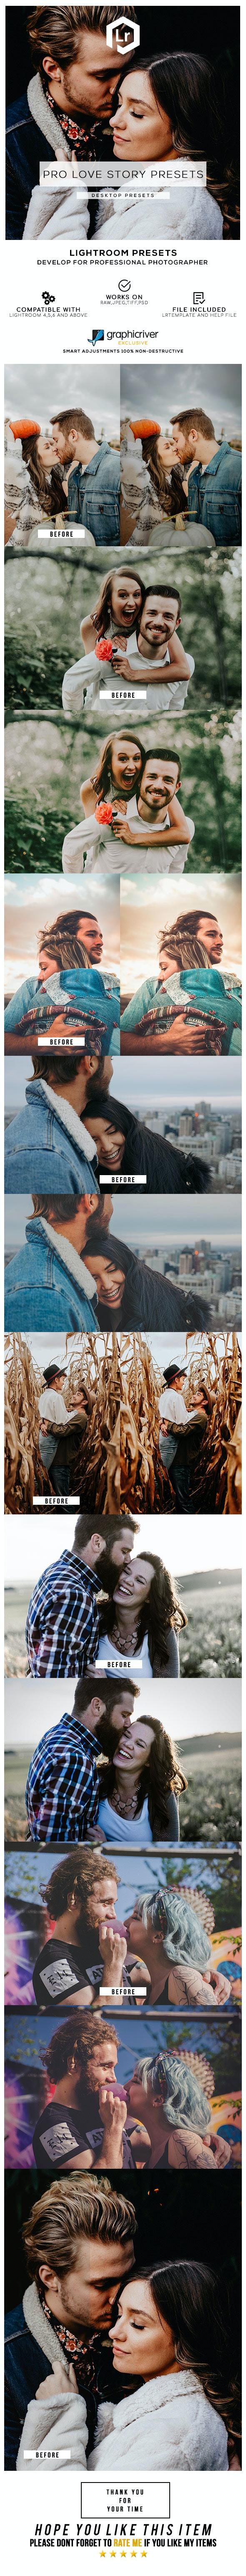 32 Pro Love Story Presets - Lightroom Presets Add-ons